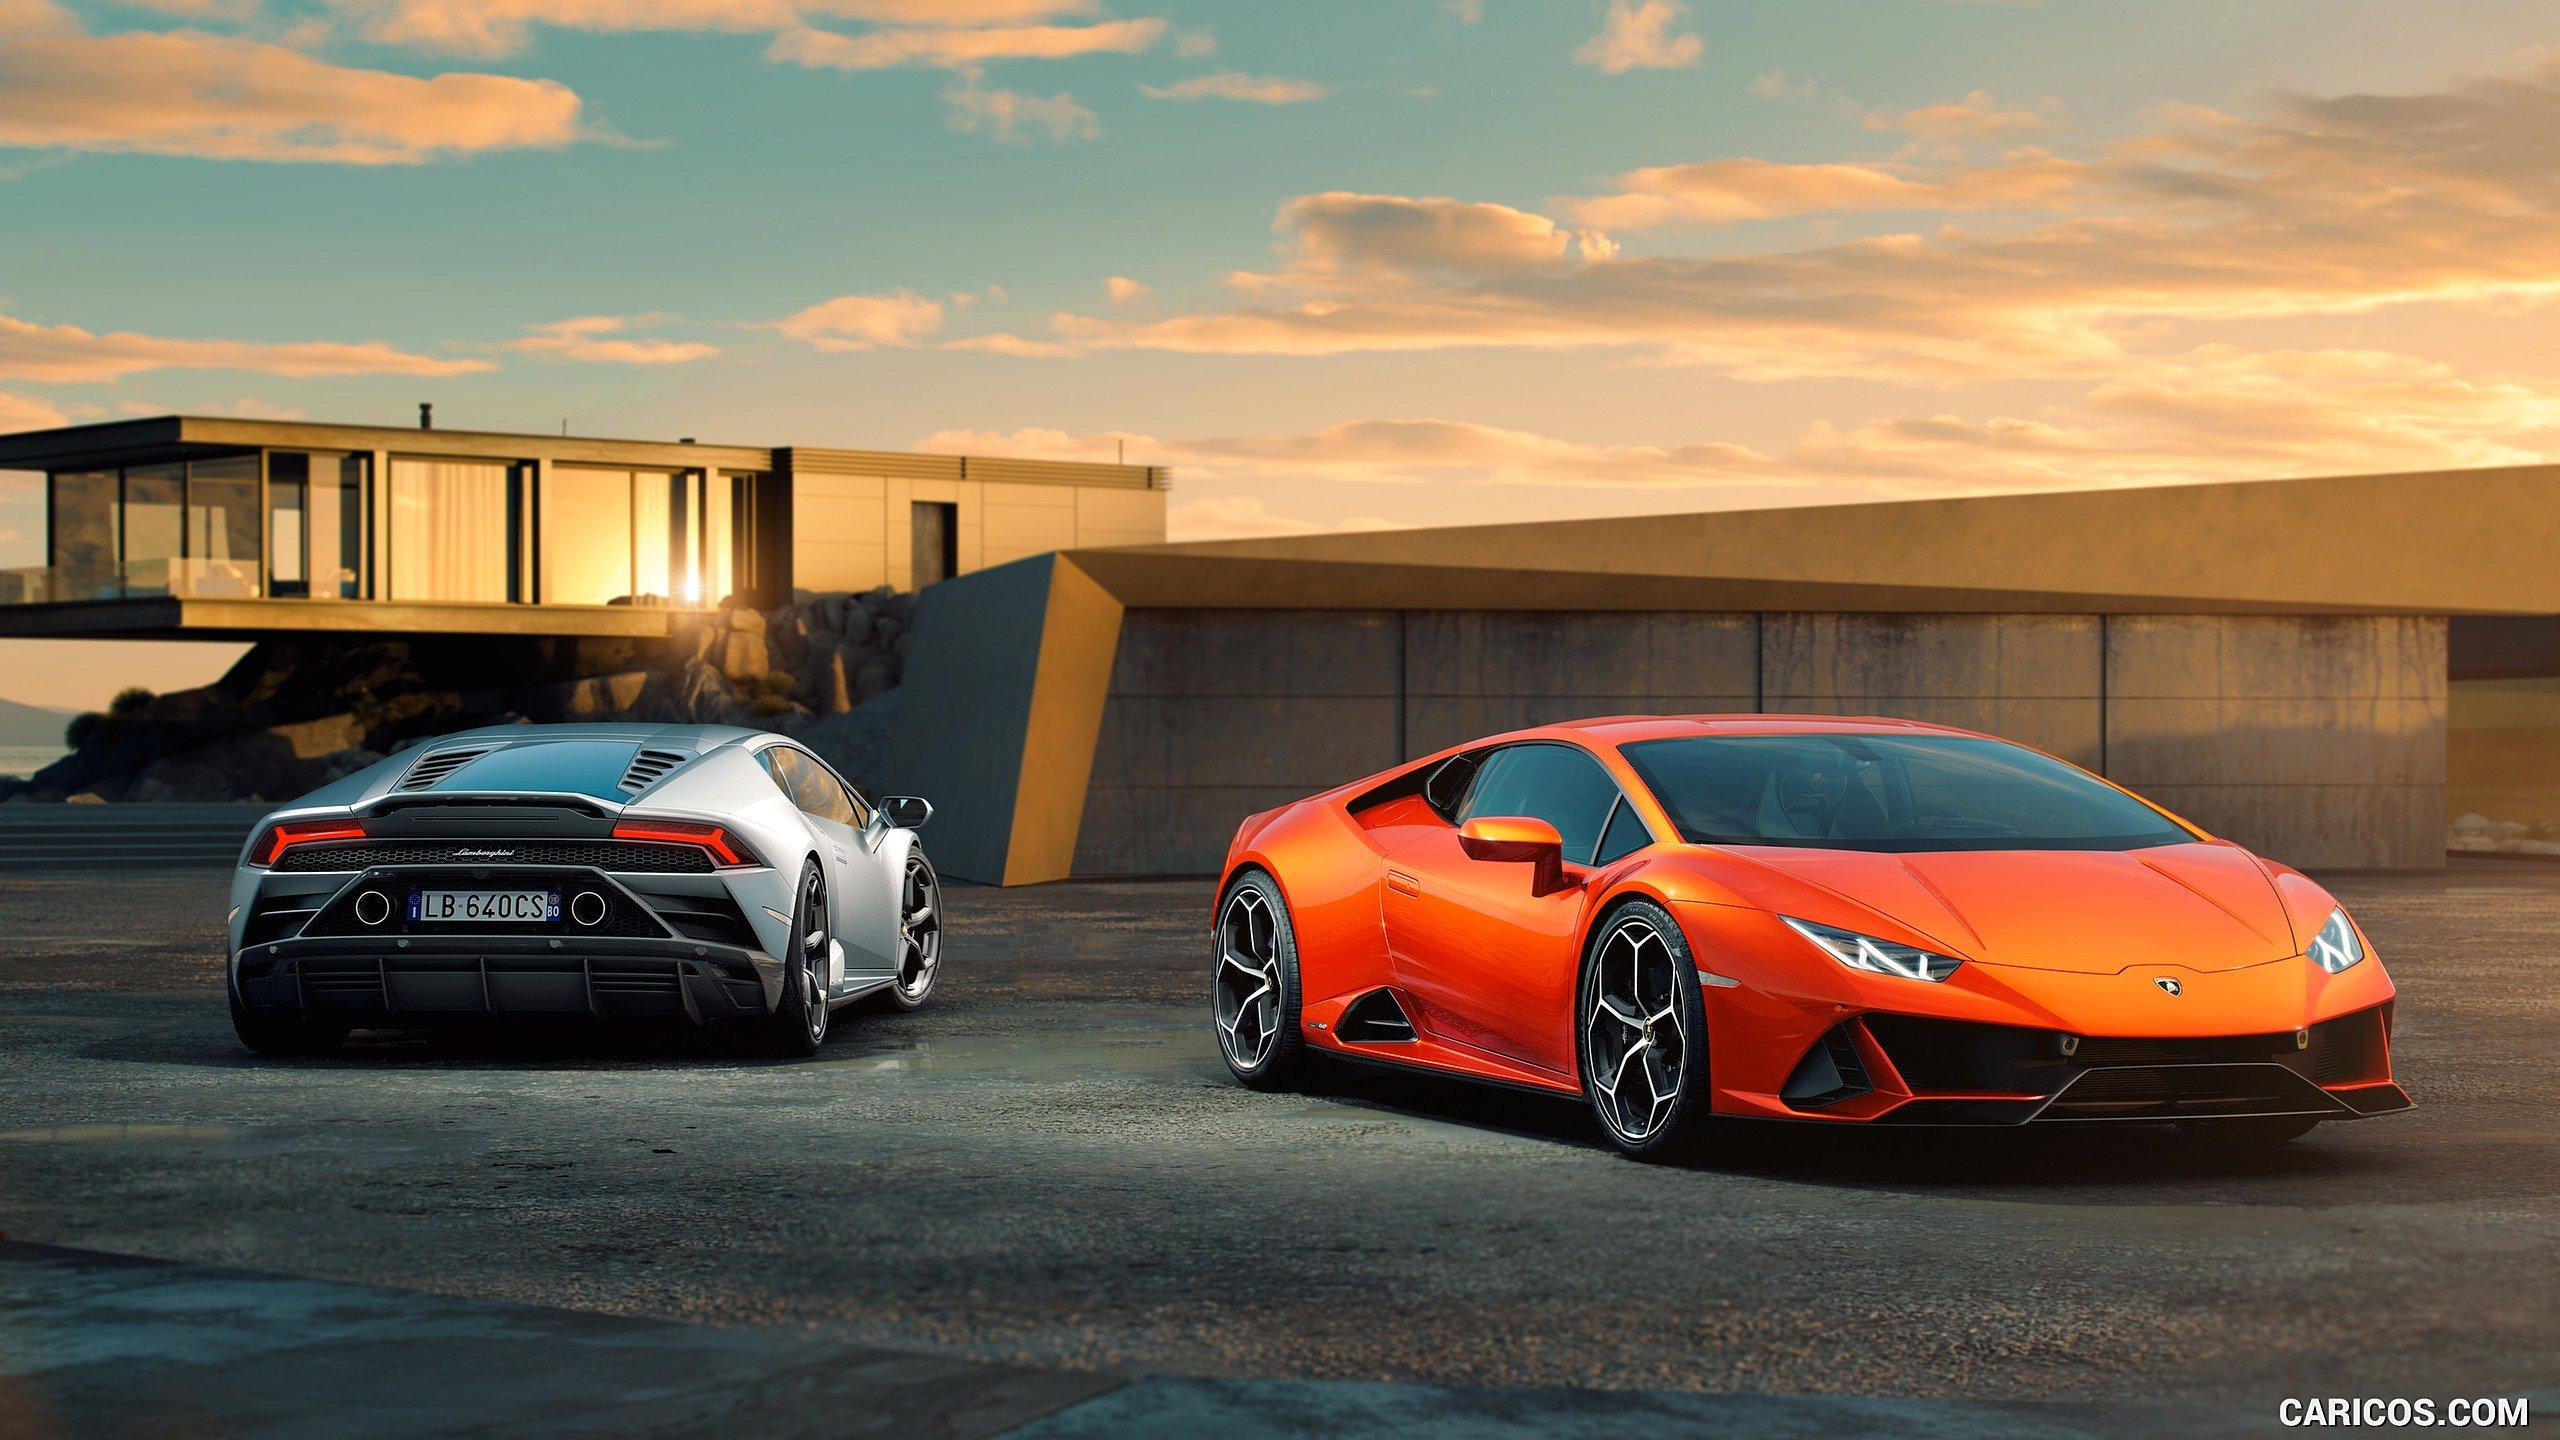 28 Lamborghini Huracán Evo Wallpapers On Wallpapersafari